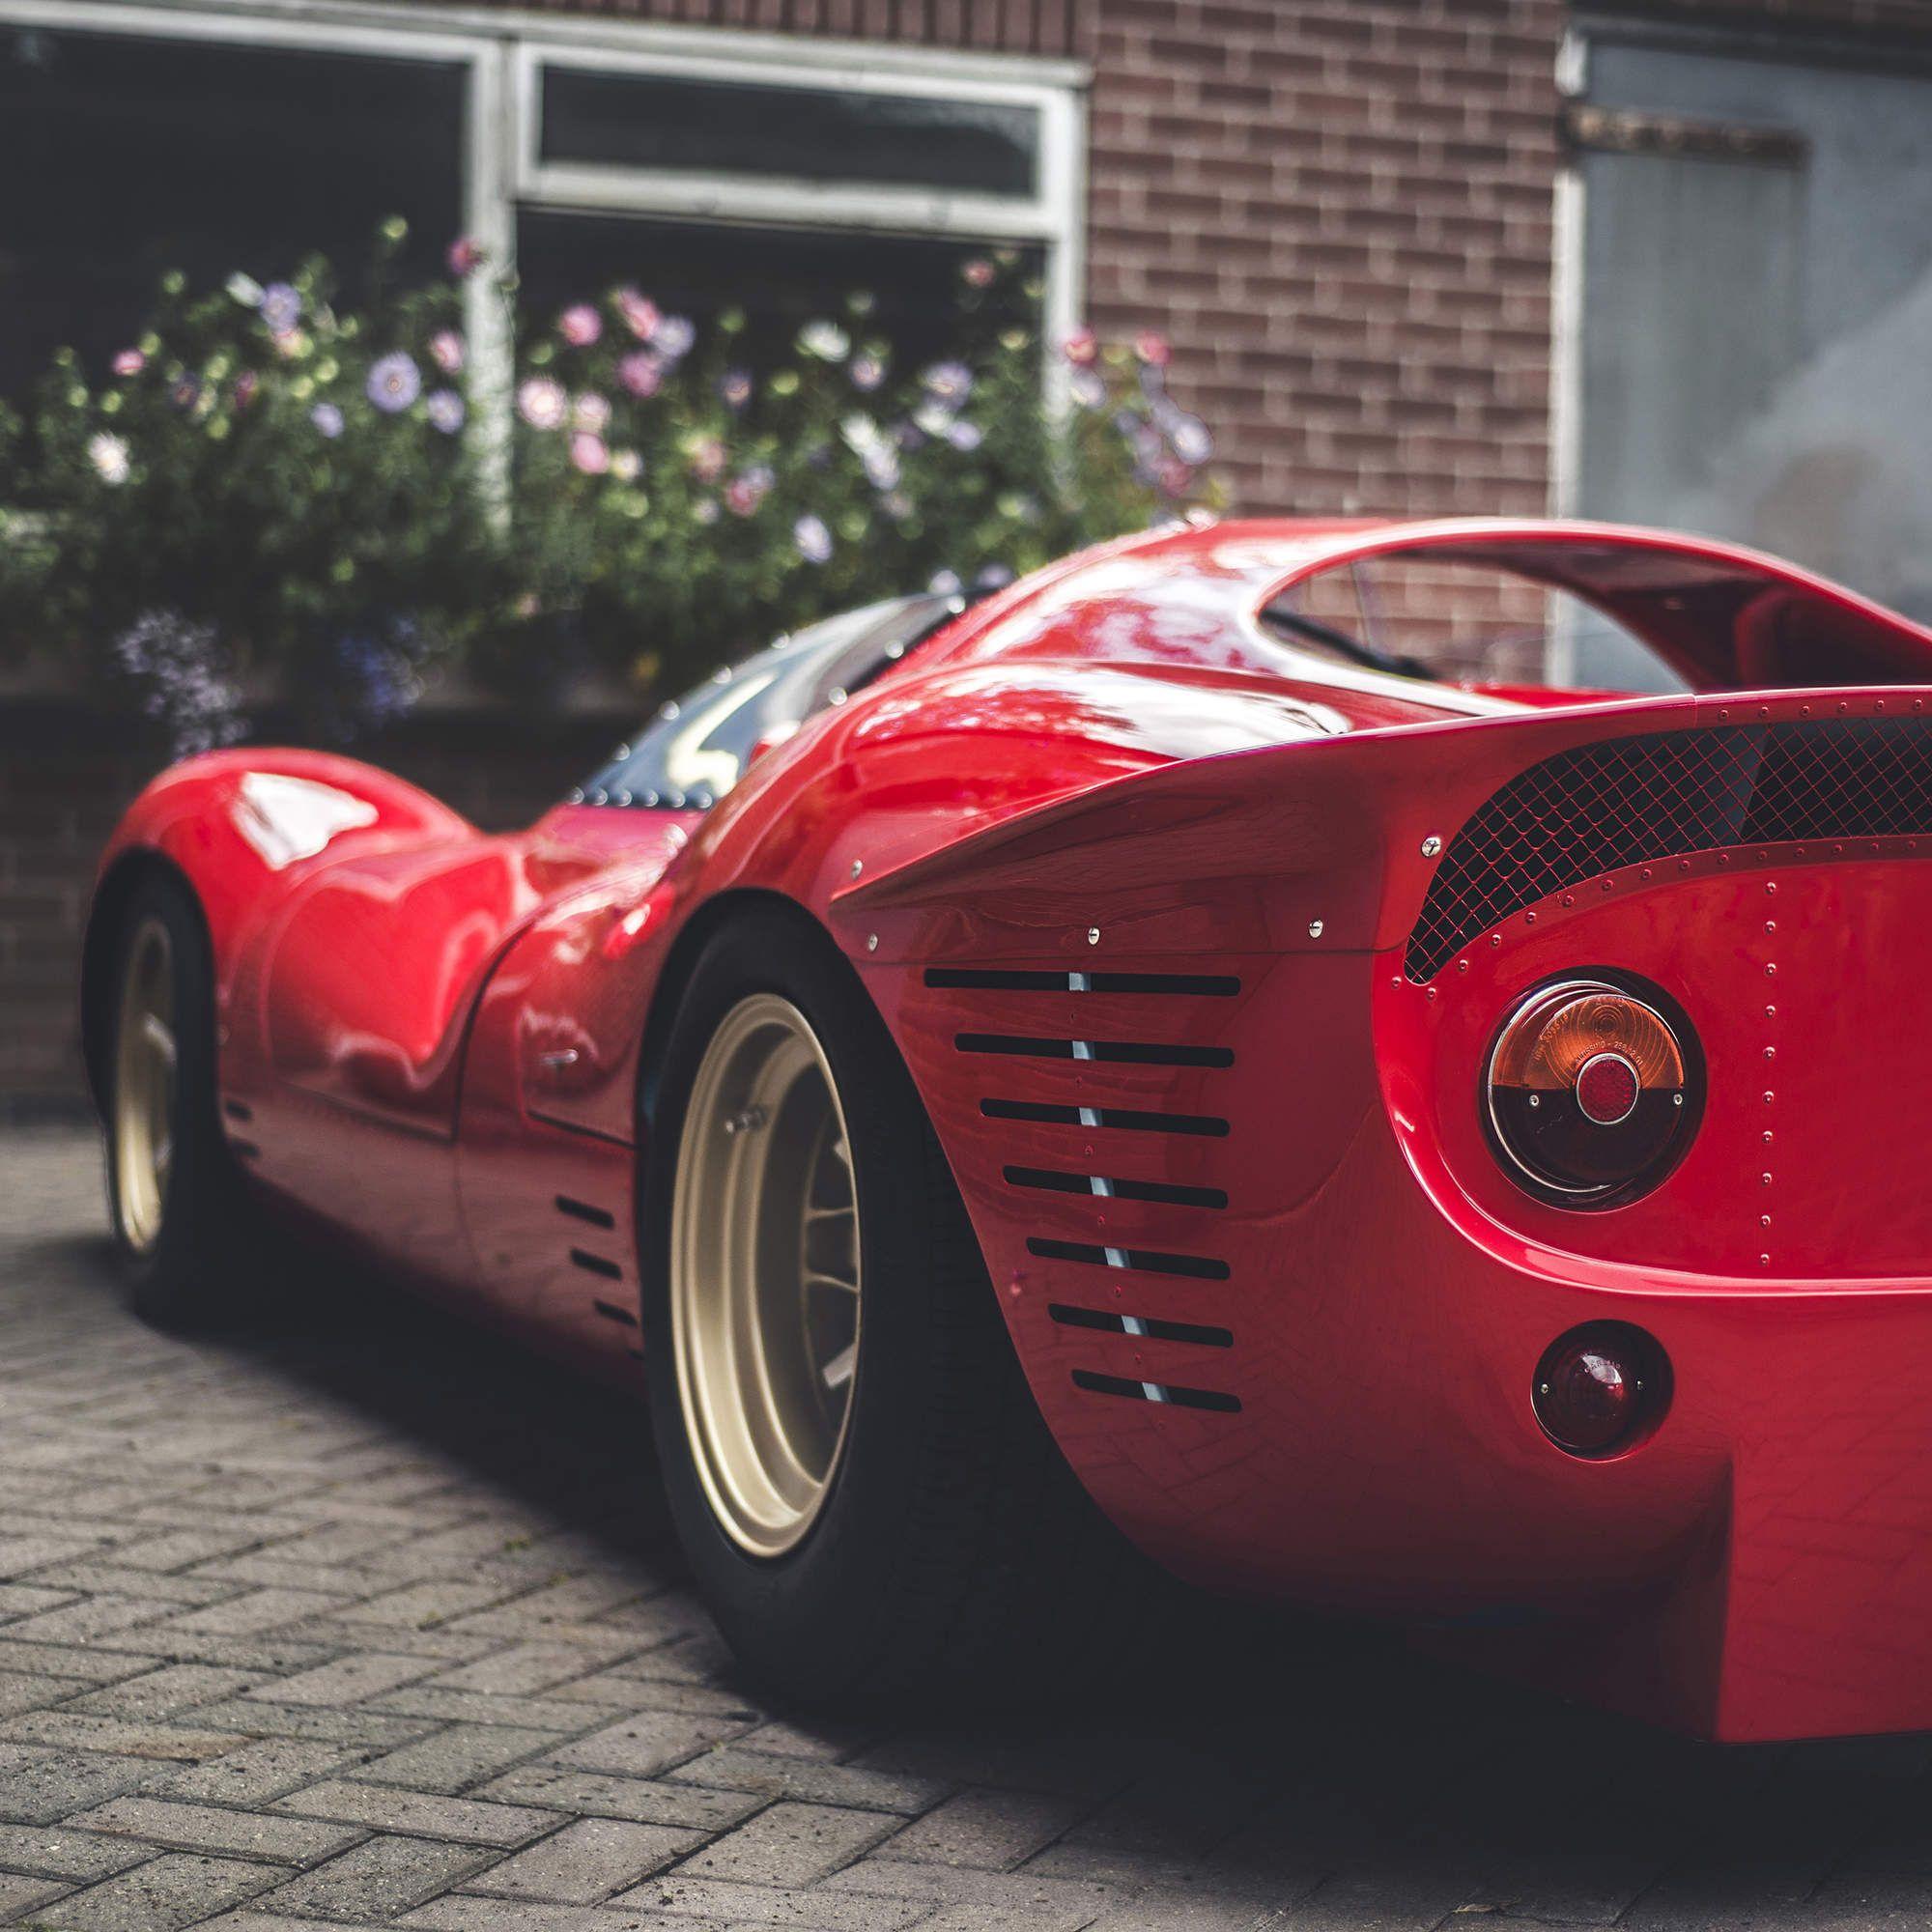 15 Glorious Photos Of The Legendary Ferrari P4